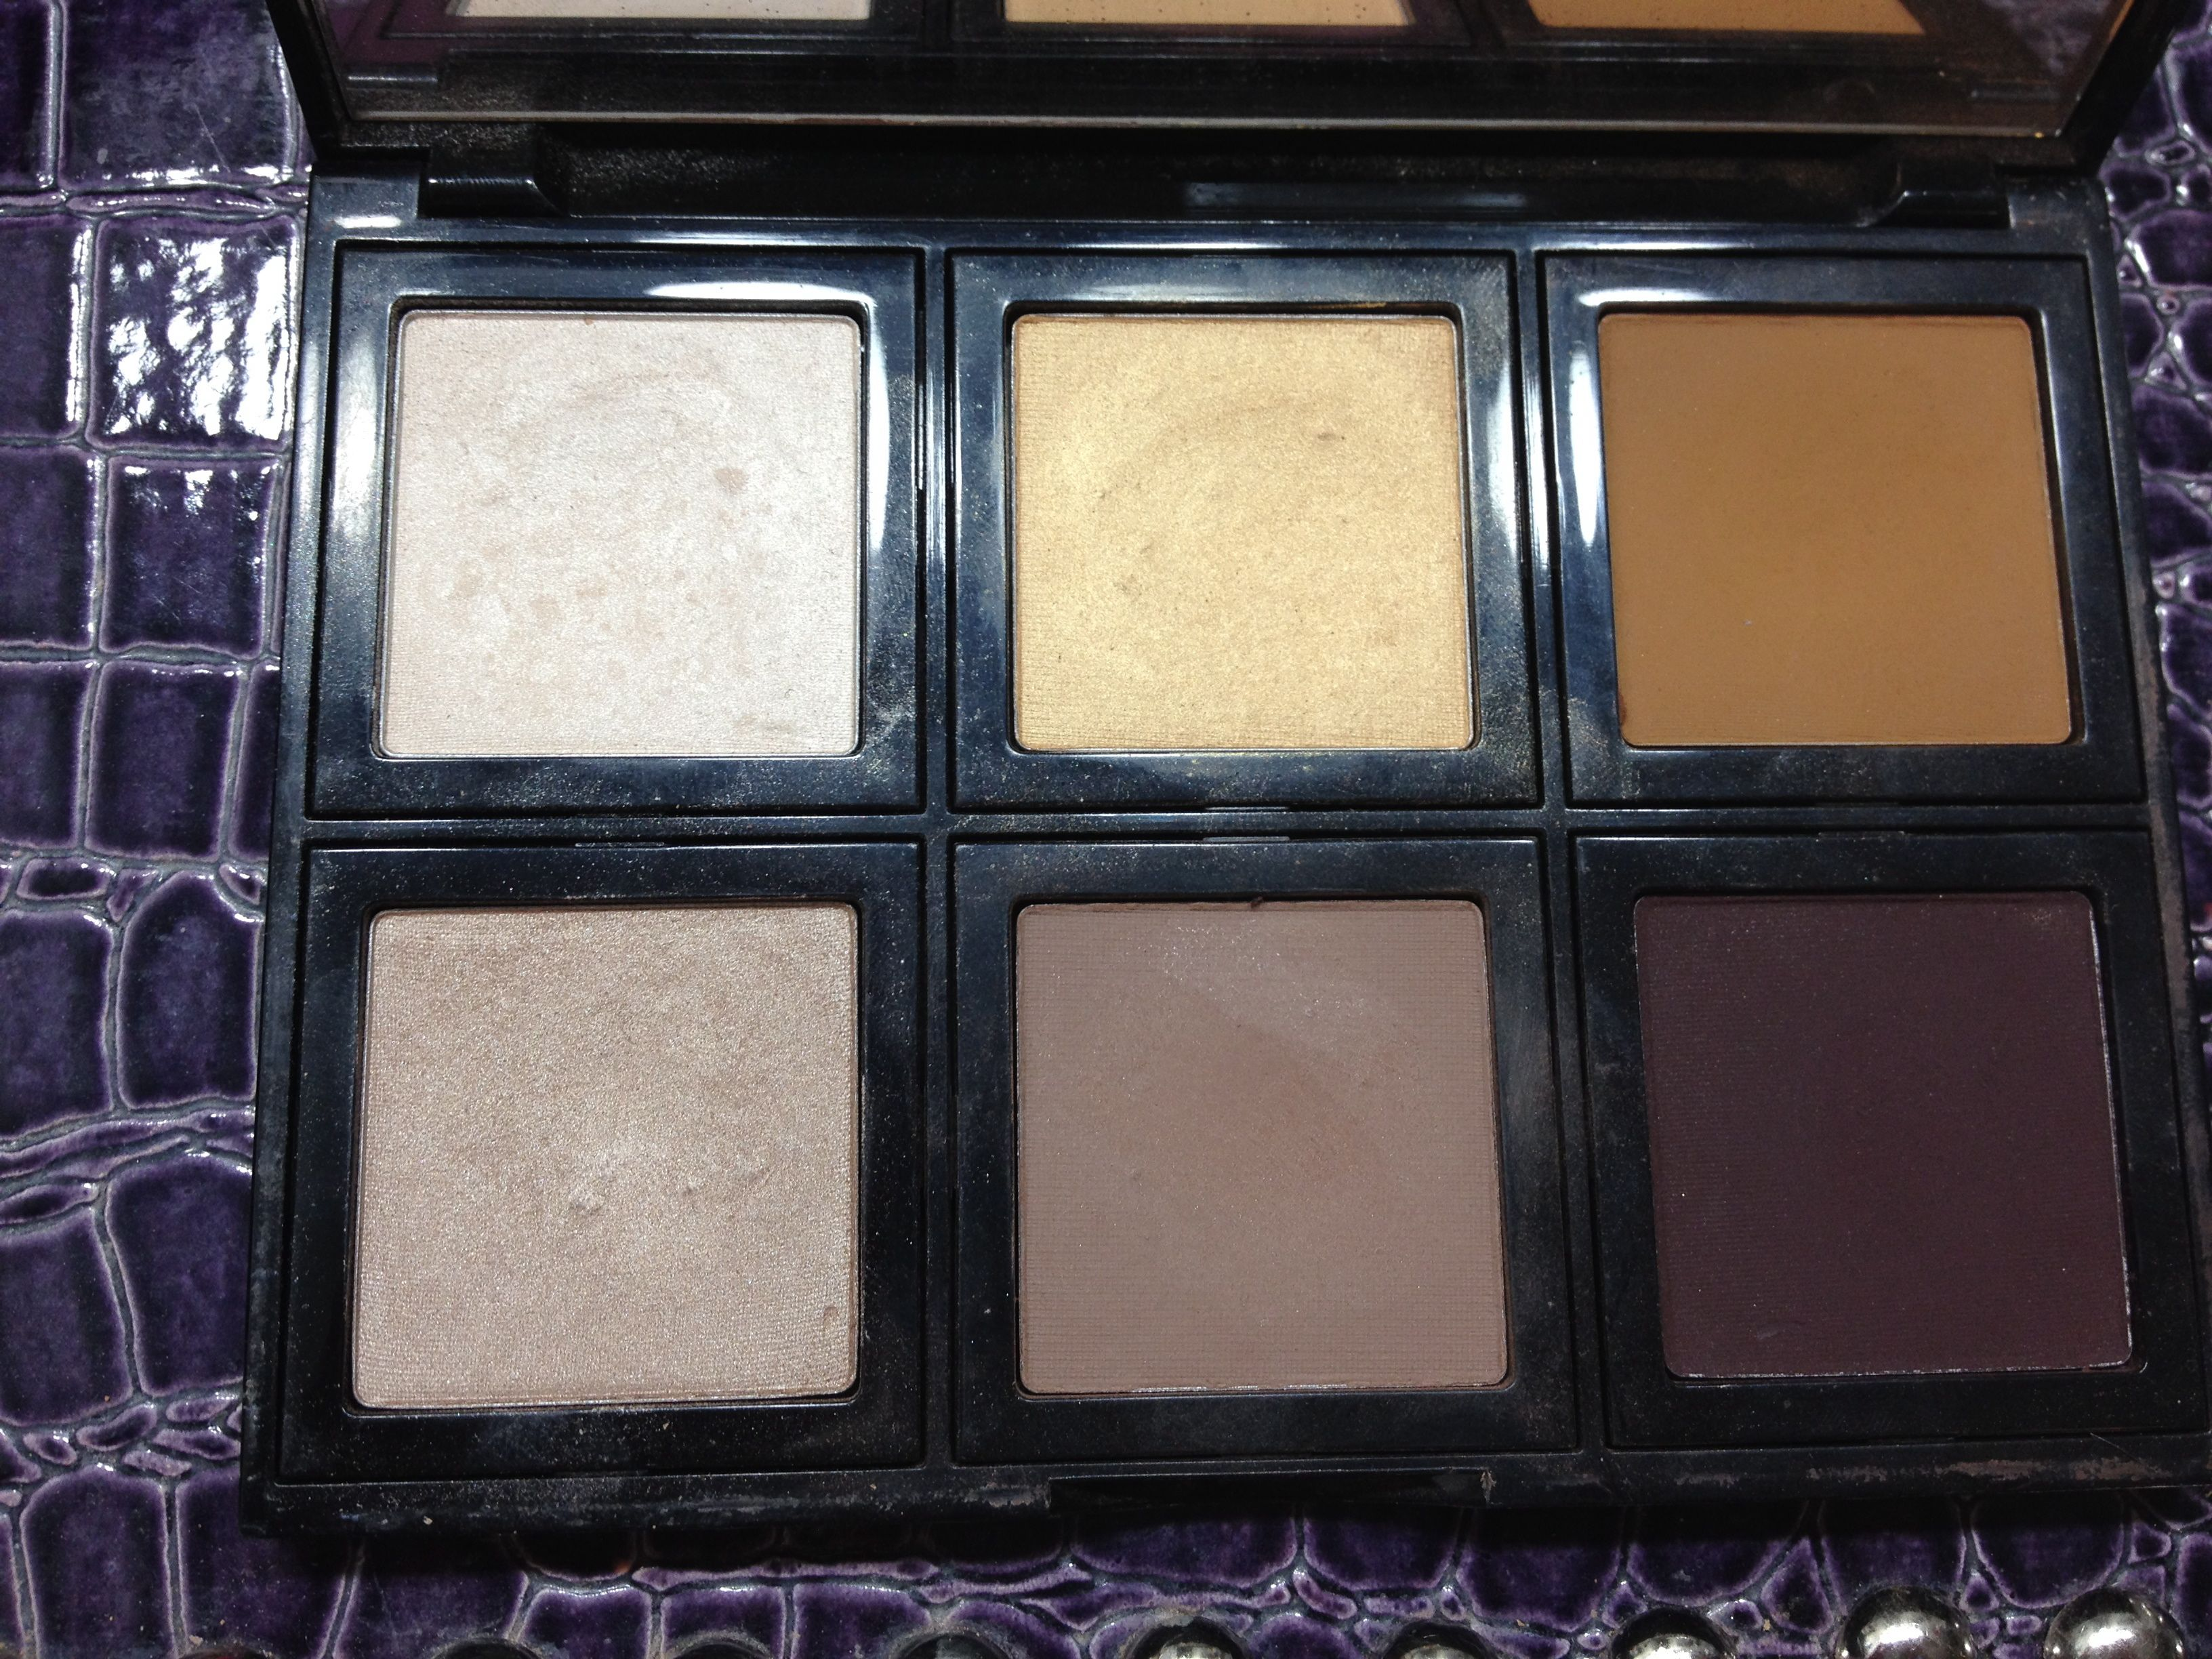 My Bobbi Brown Eyeshadow Palette For BLONDES Sunset